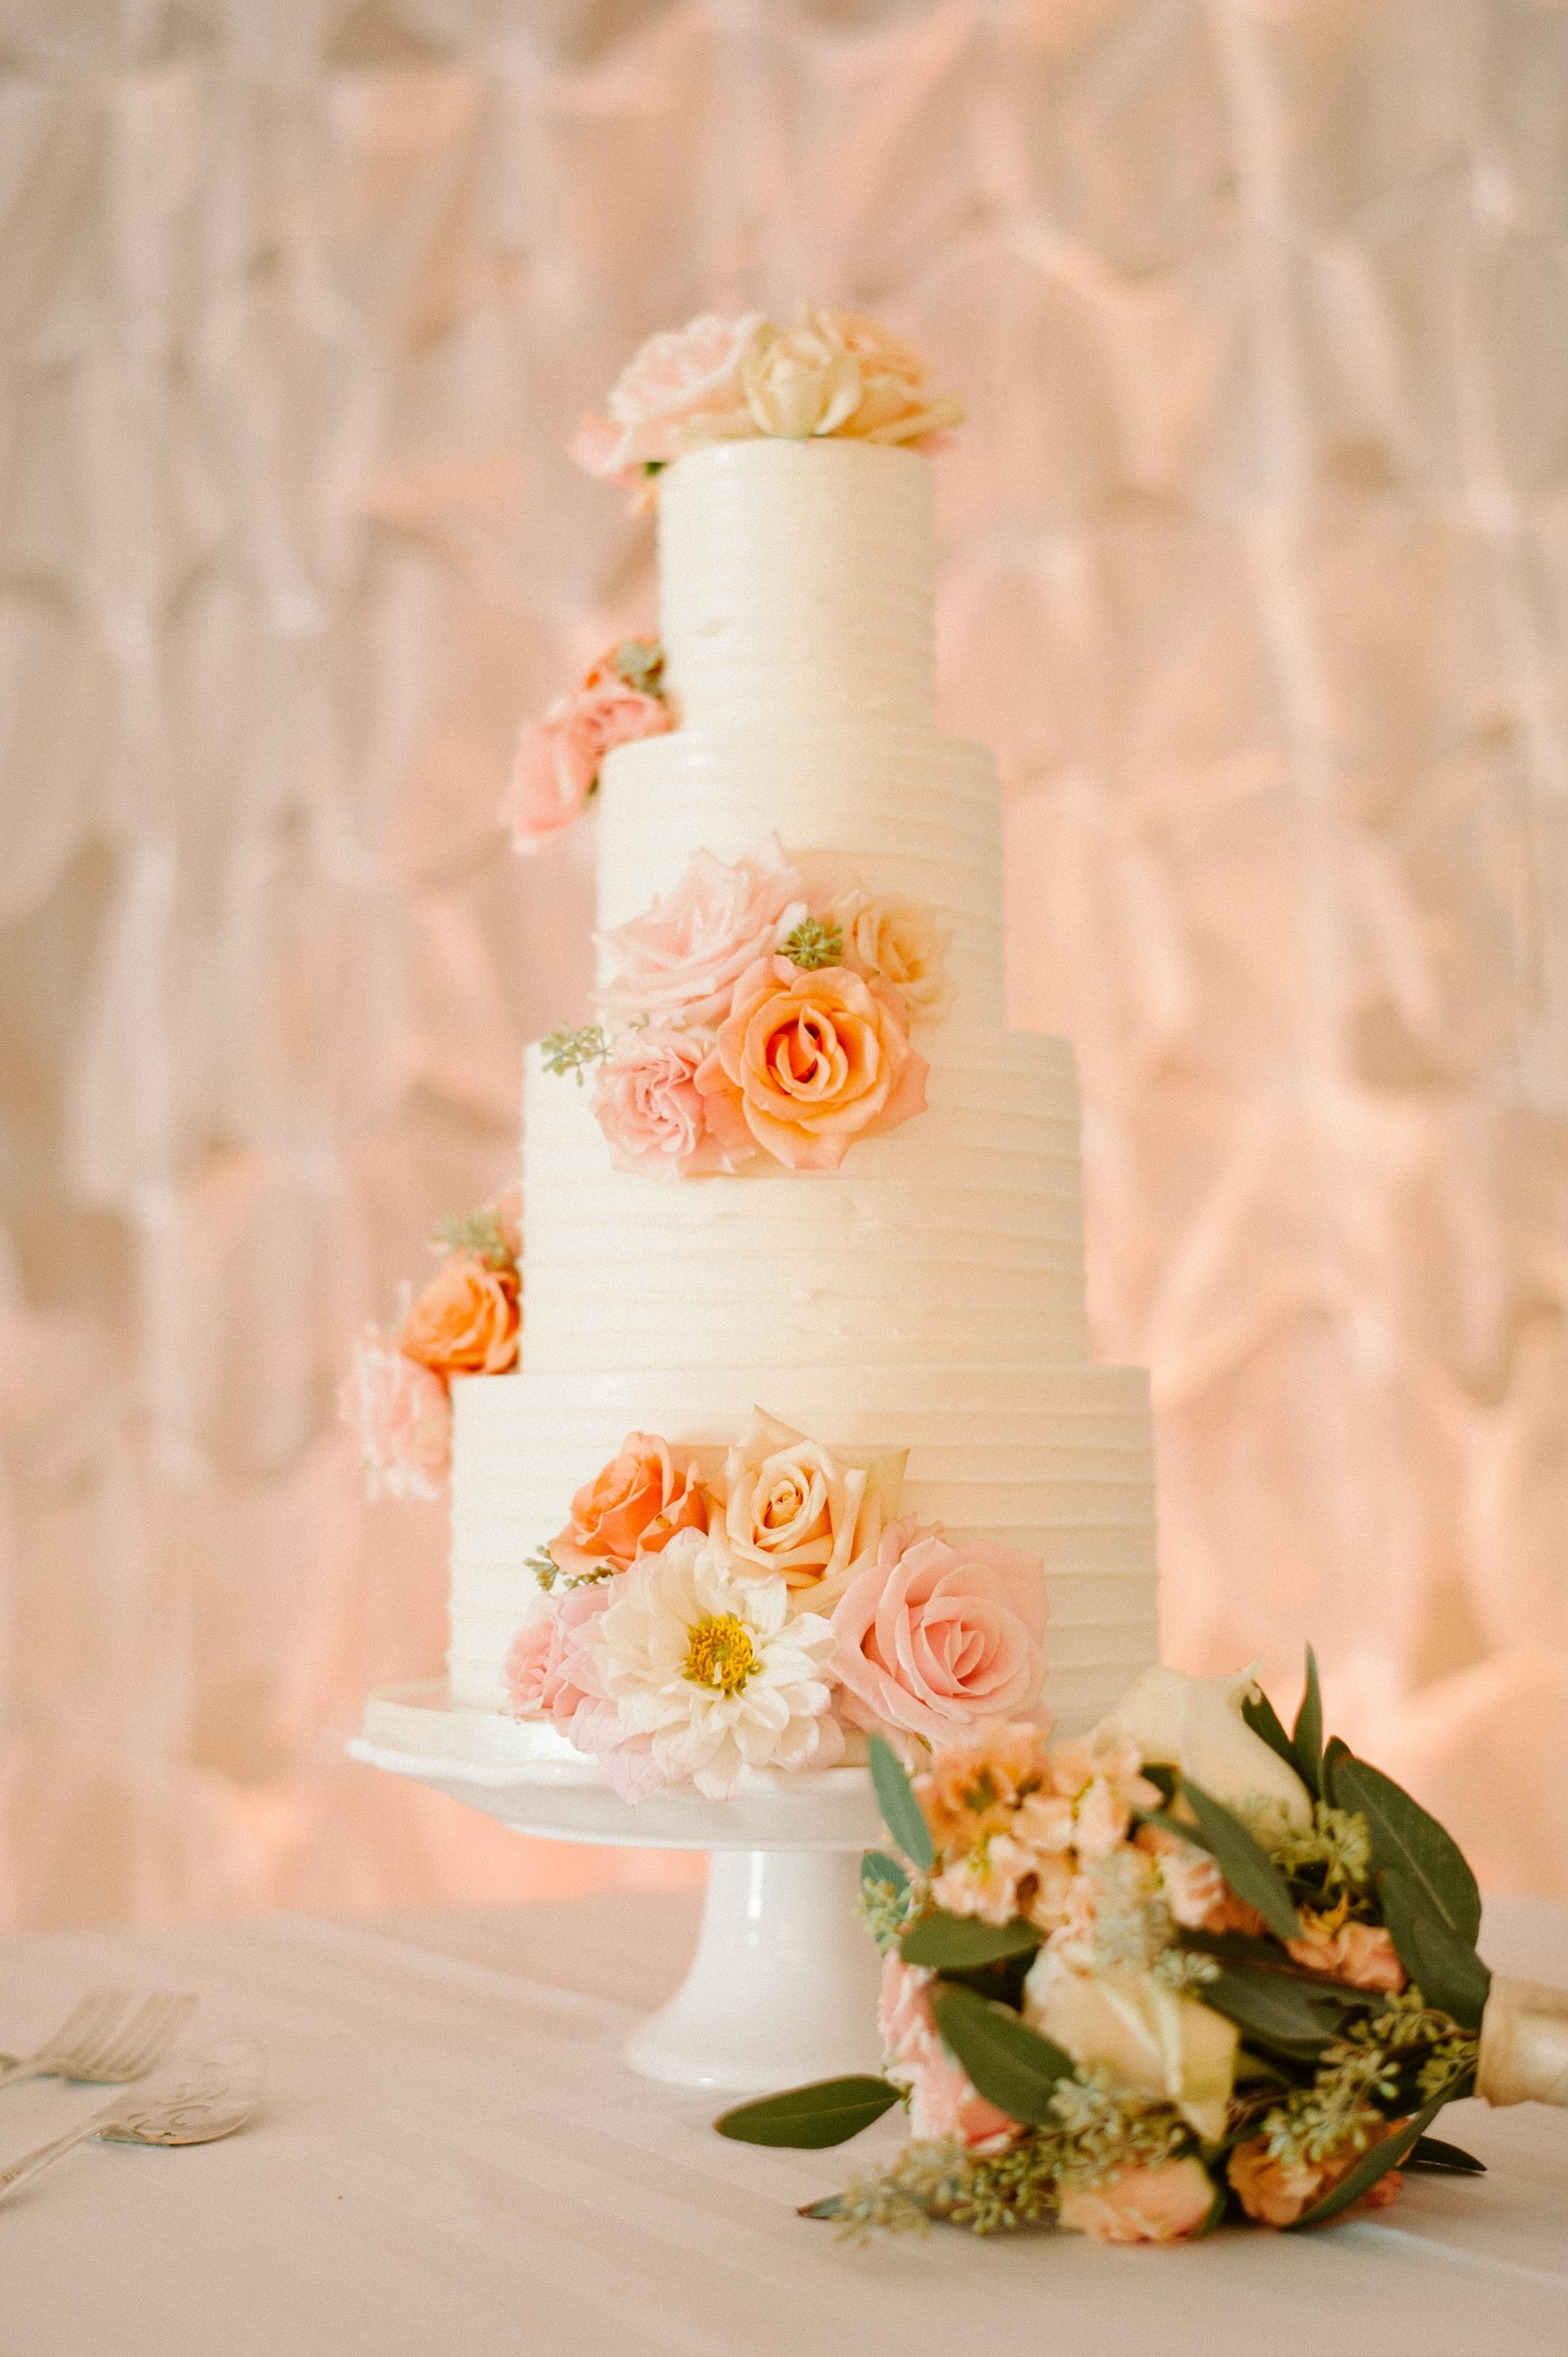 horizontal-textured-buttercream-on-rustic-wedding-cake-sweet-cheeks-baking-acres-of-hope-photography-3-web